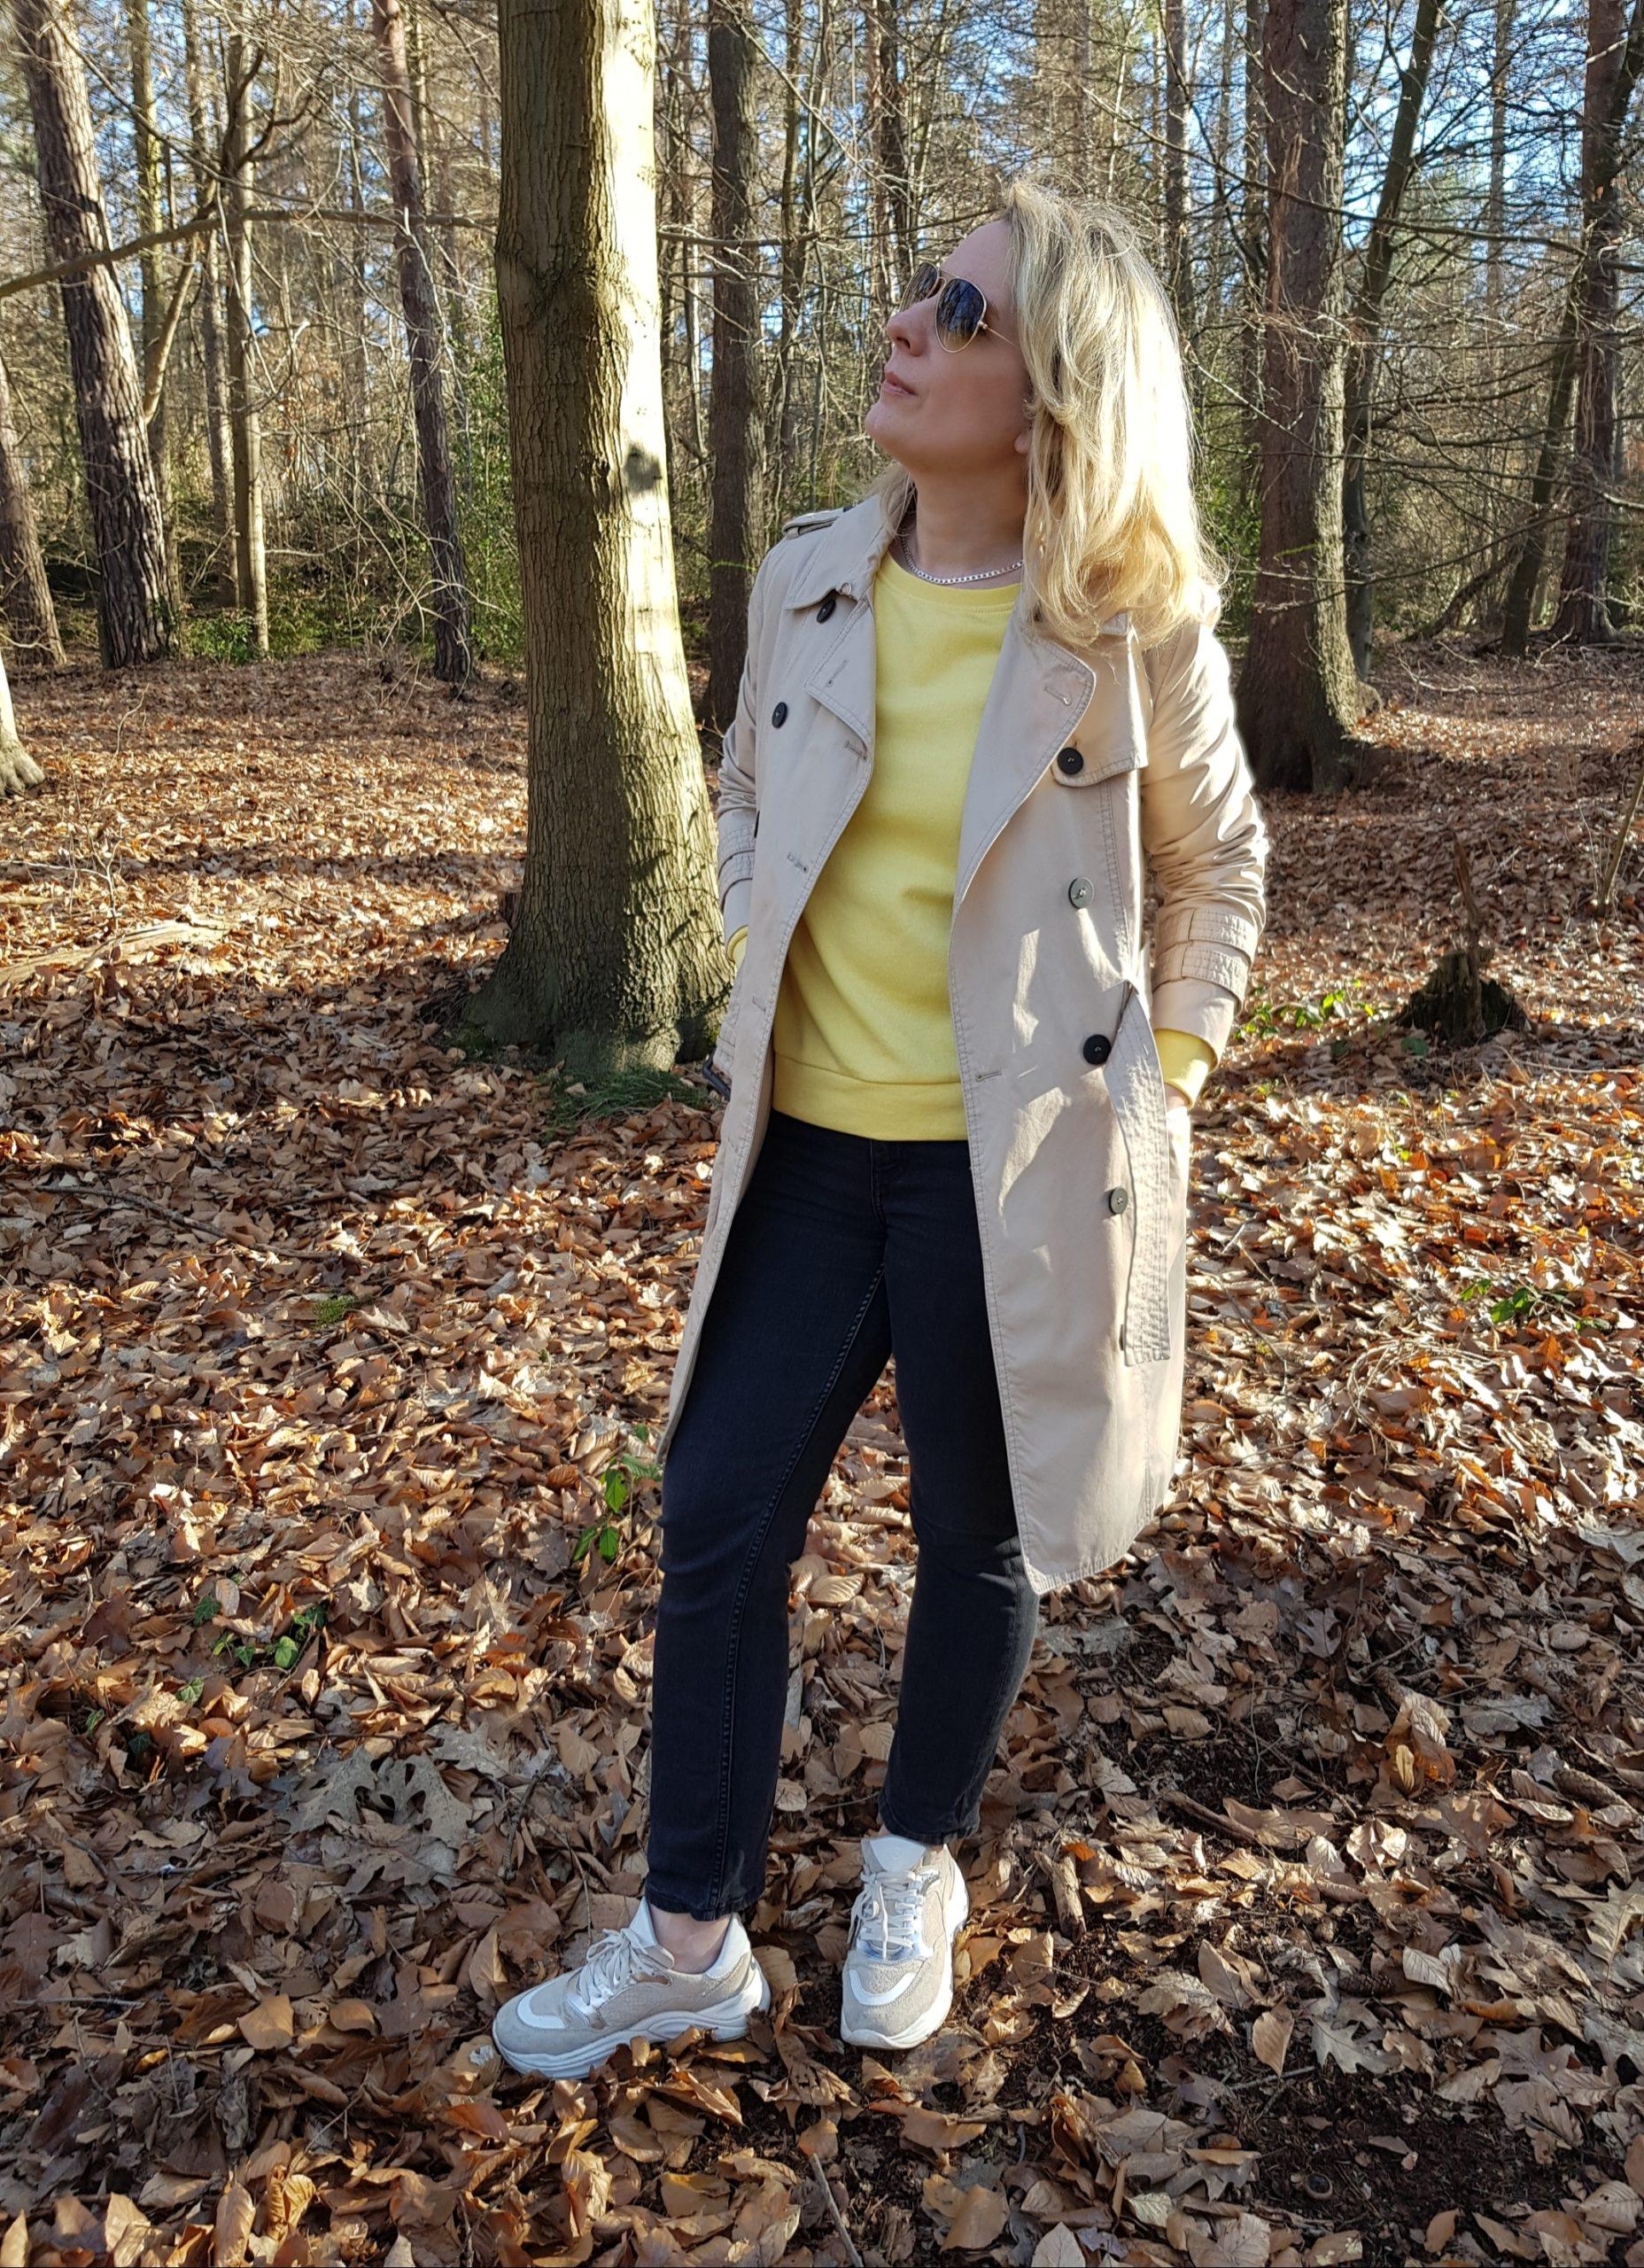 -fashion-Mode-Outfit-sportlich-Stil-Gelb-Farbe-Frühling